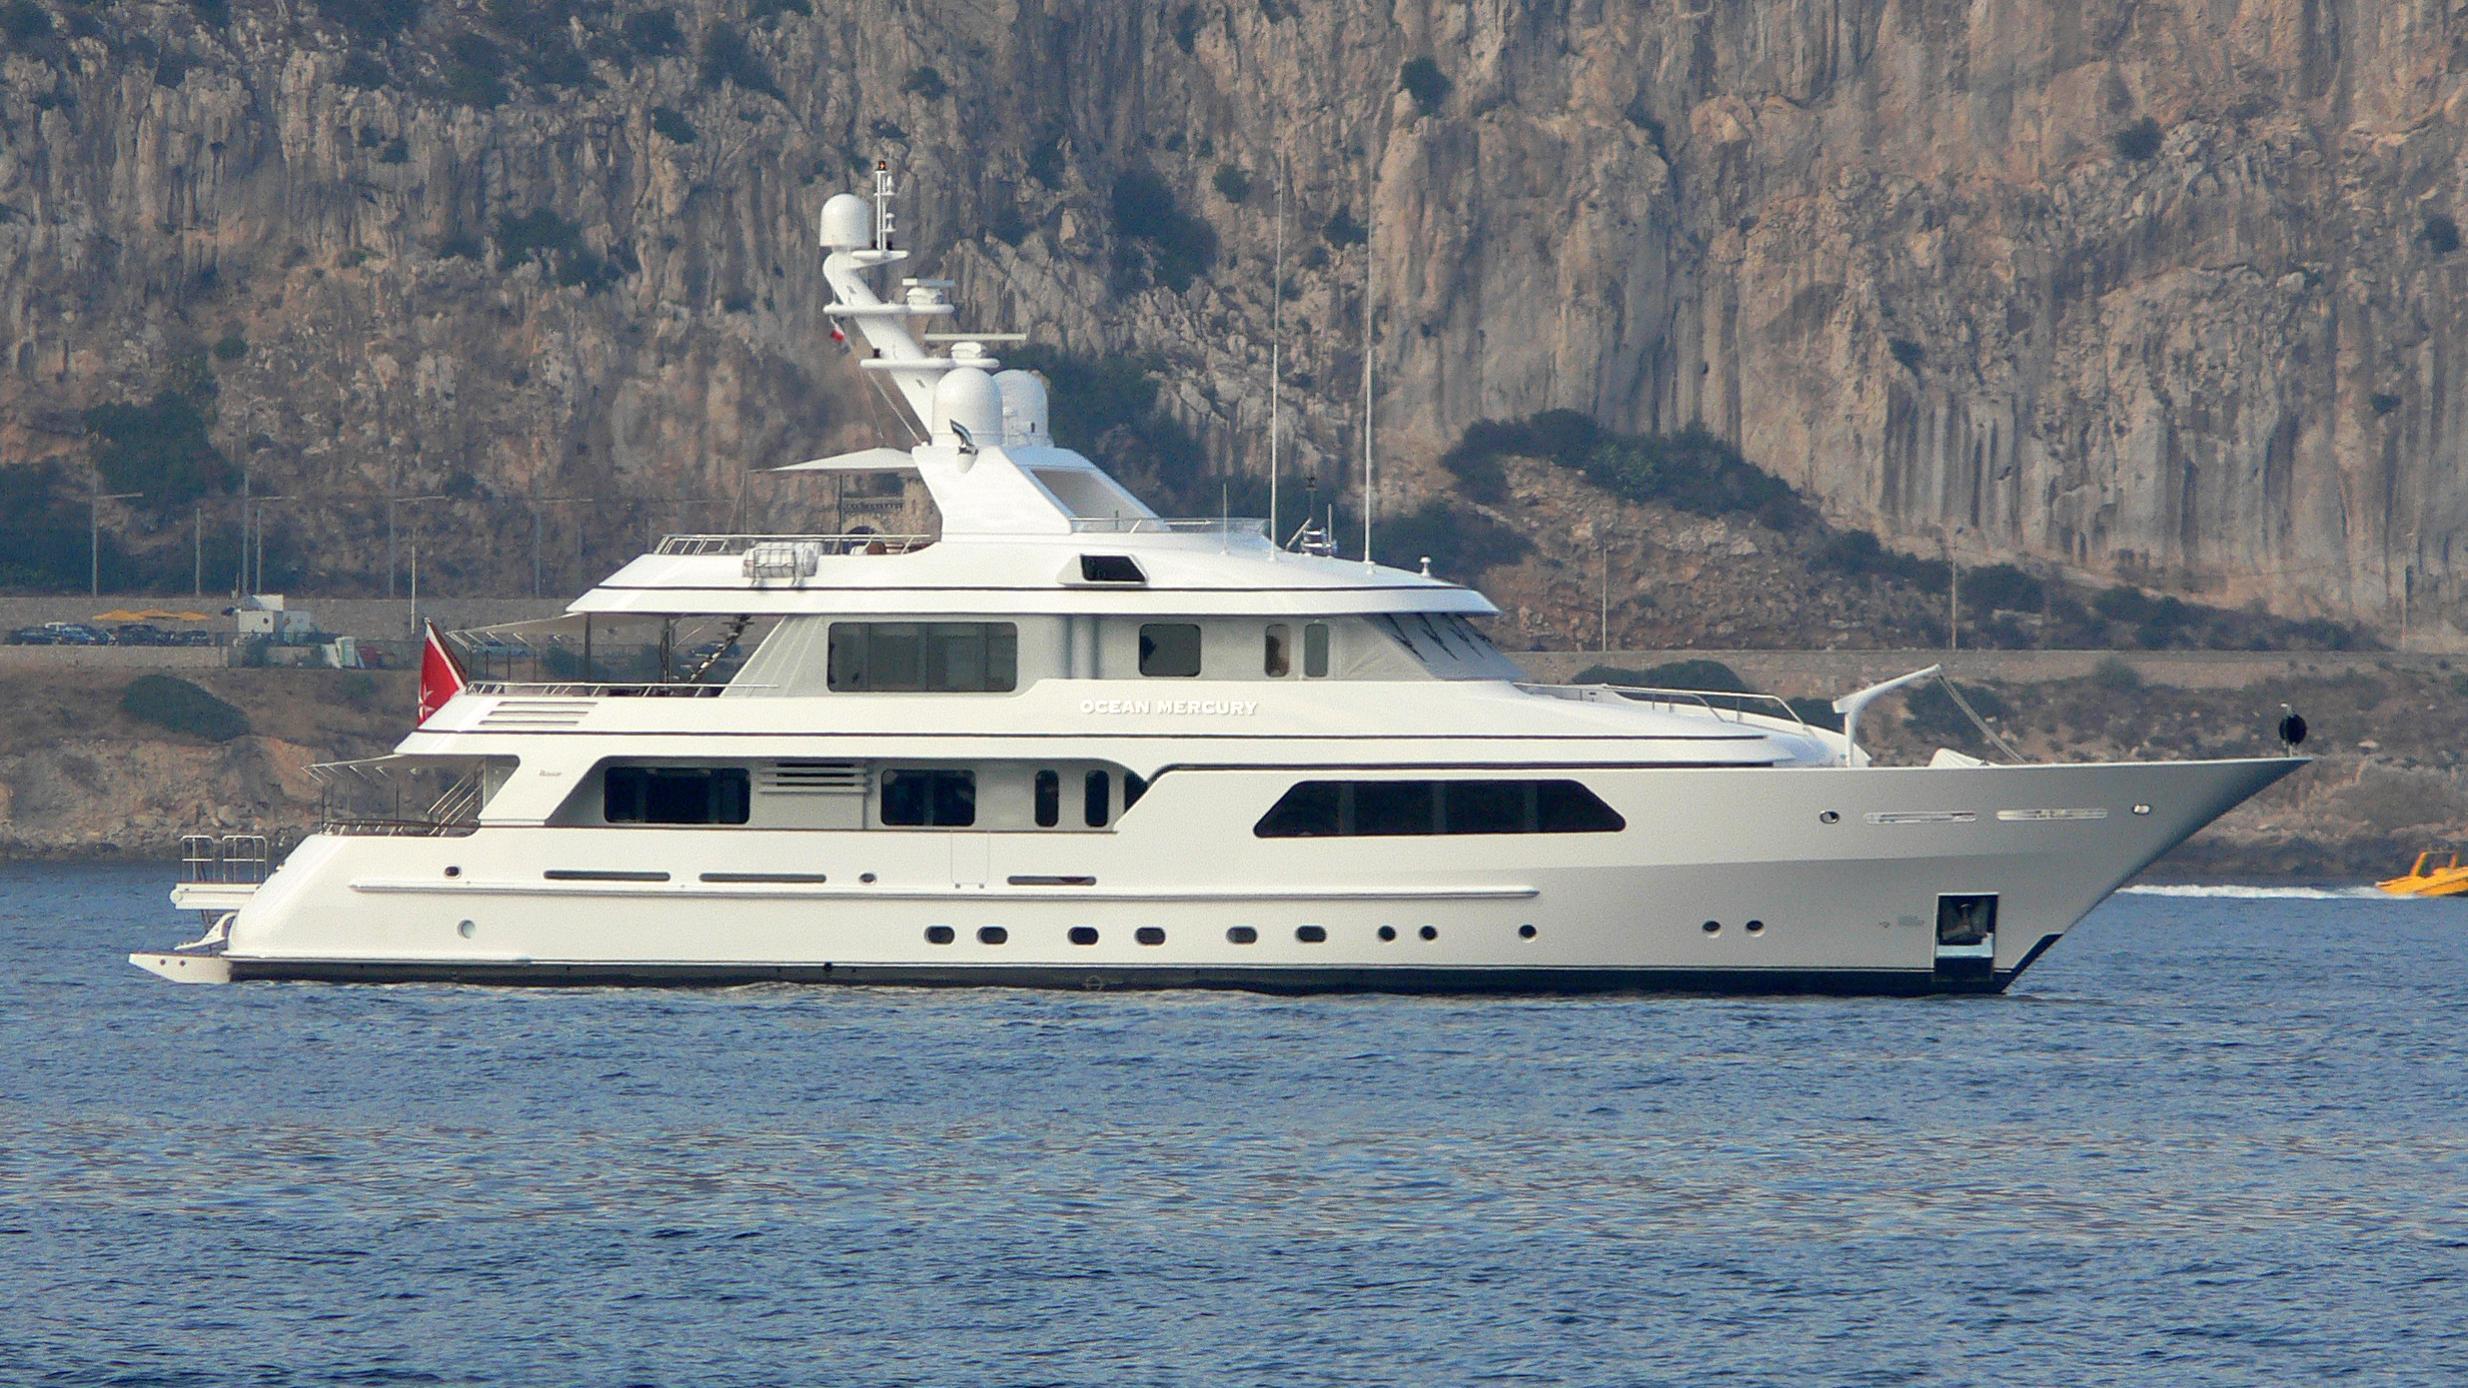 ocean-mercury-motor-yacht-feadship-SI-39-mki-2008-profile